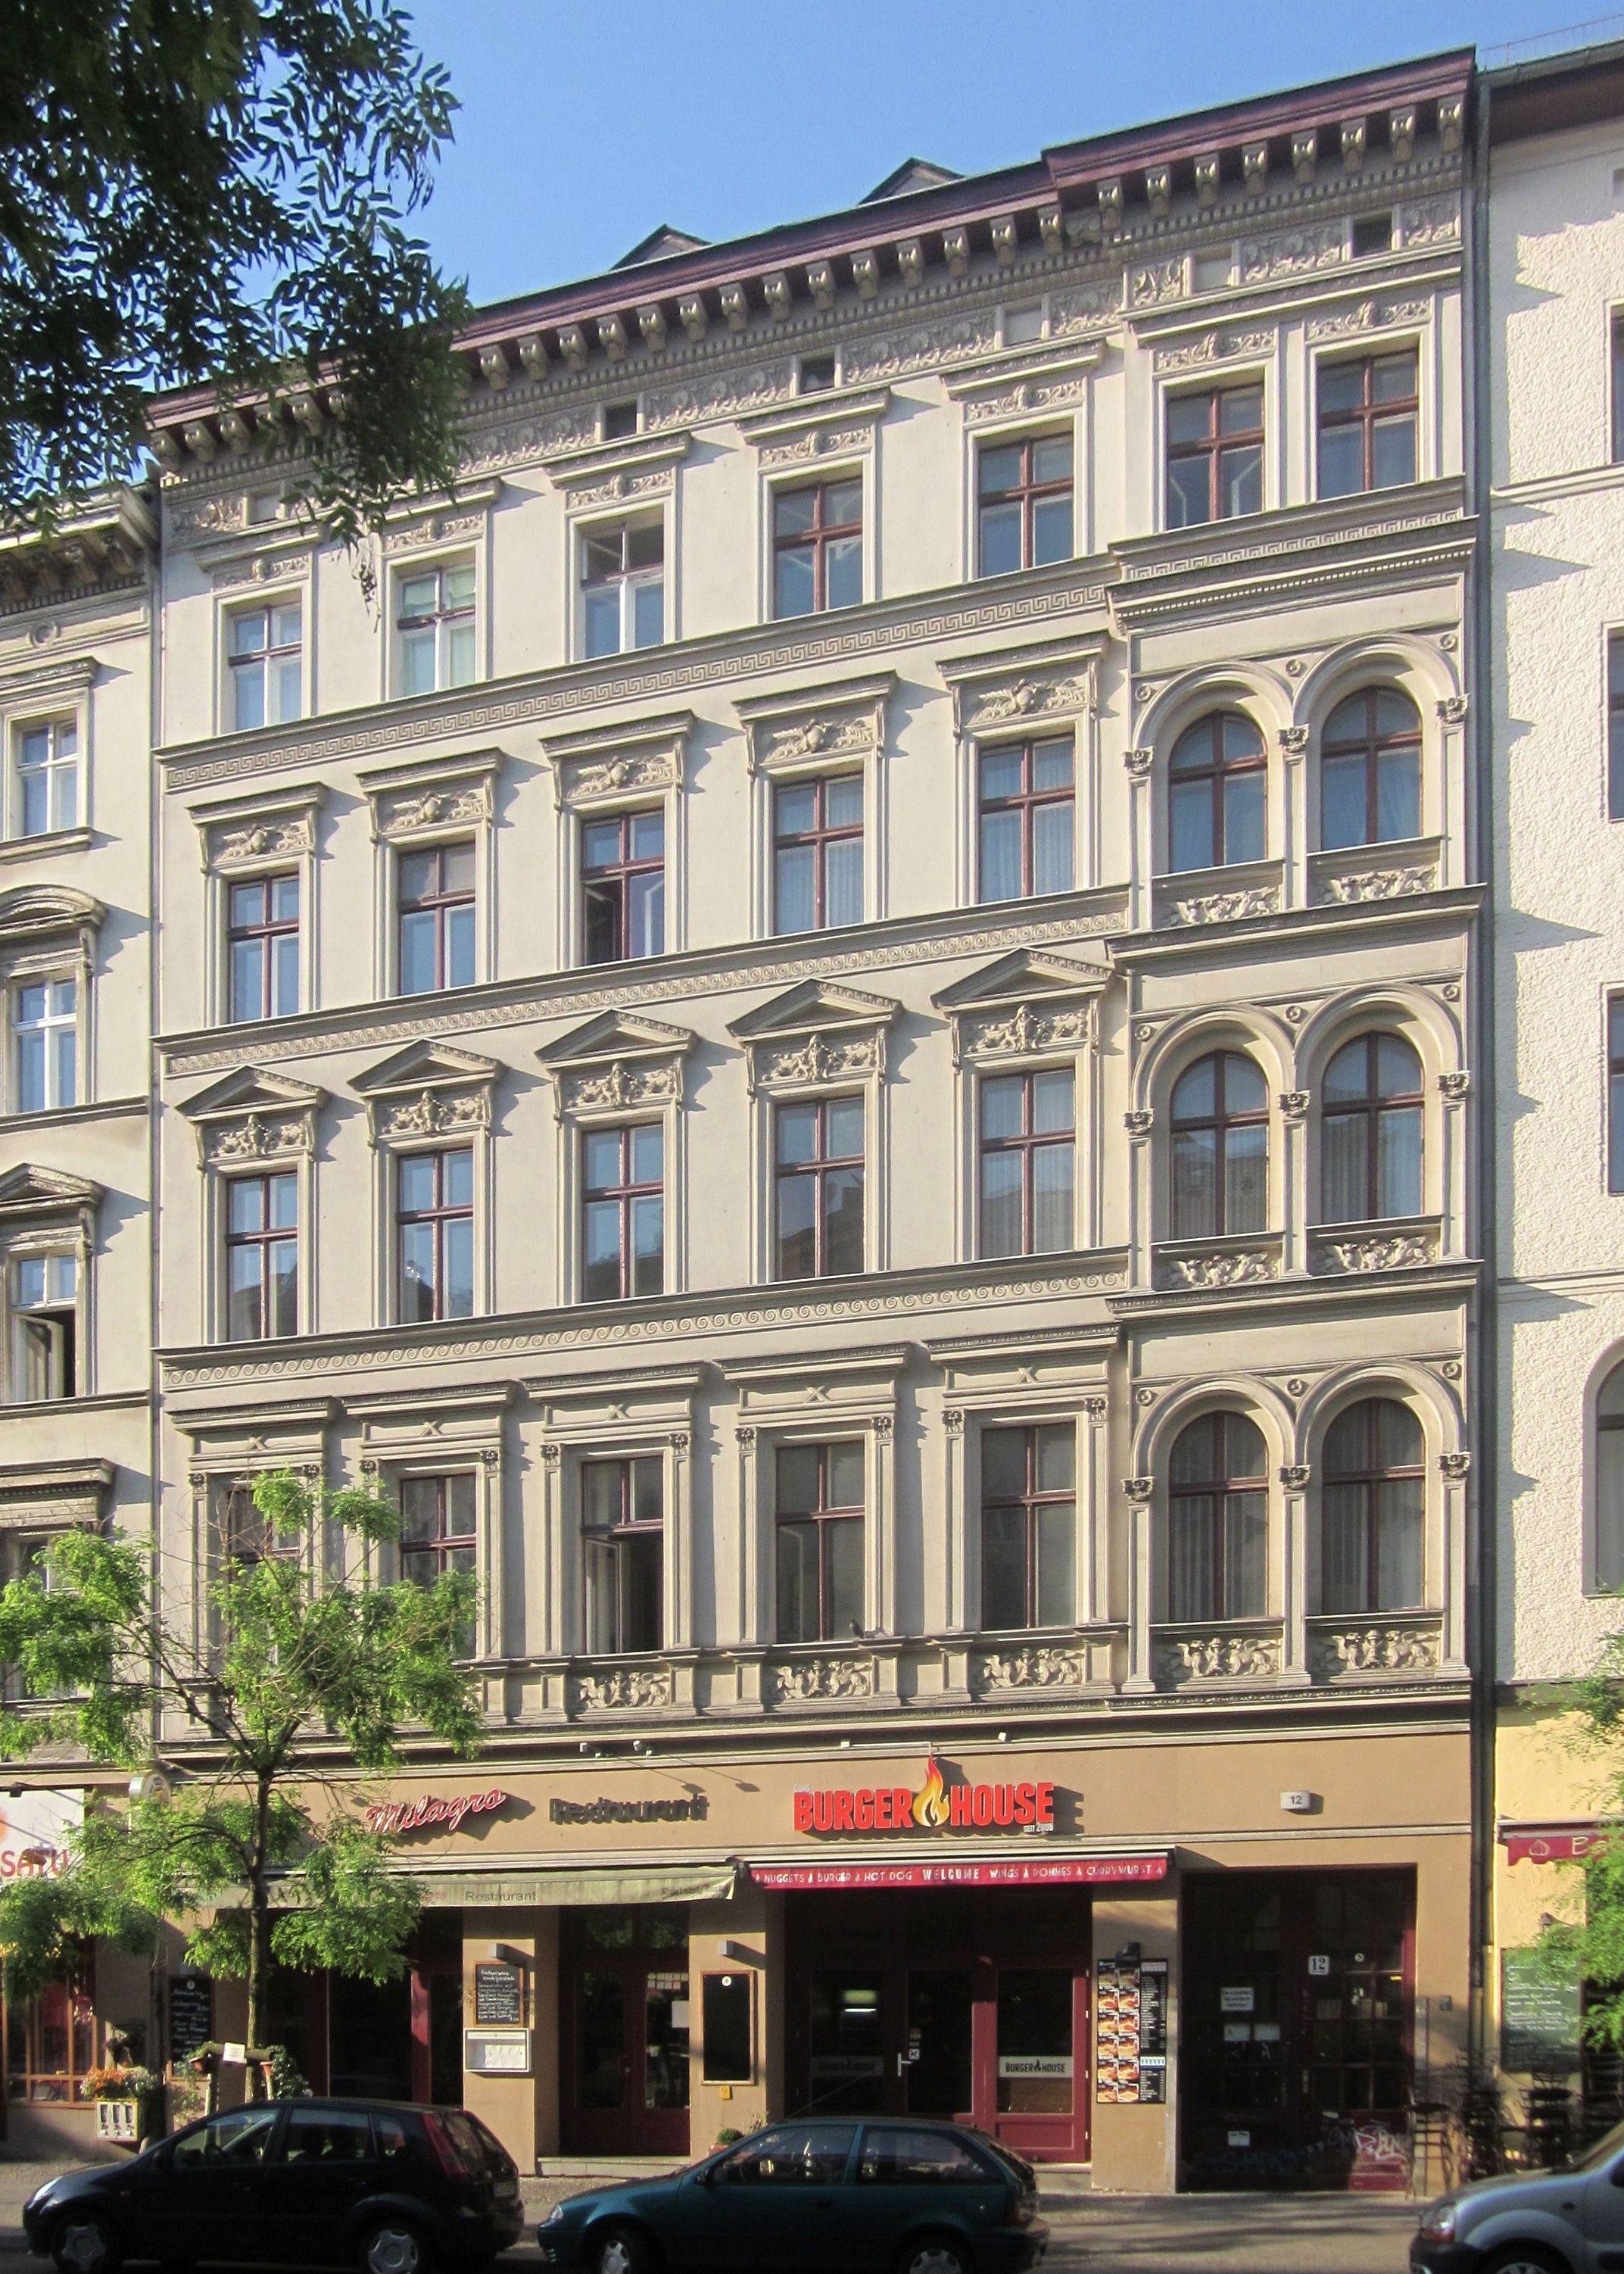 file berlin kreuzberg bergmannstrasse 12 wikimedia commons. Black Bedroom Furniture Sets. Home Design Ideas